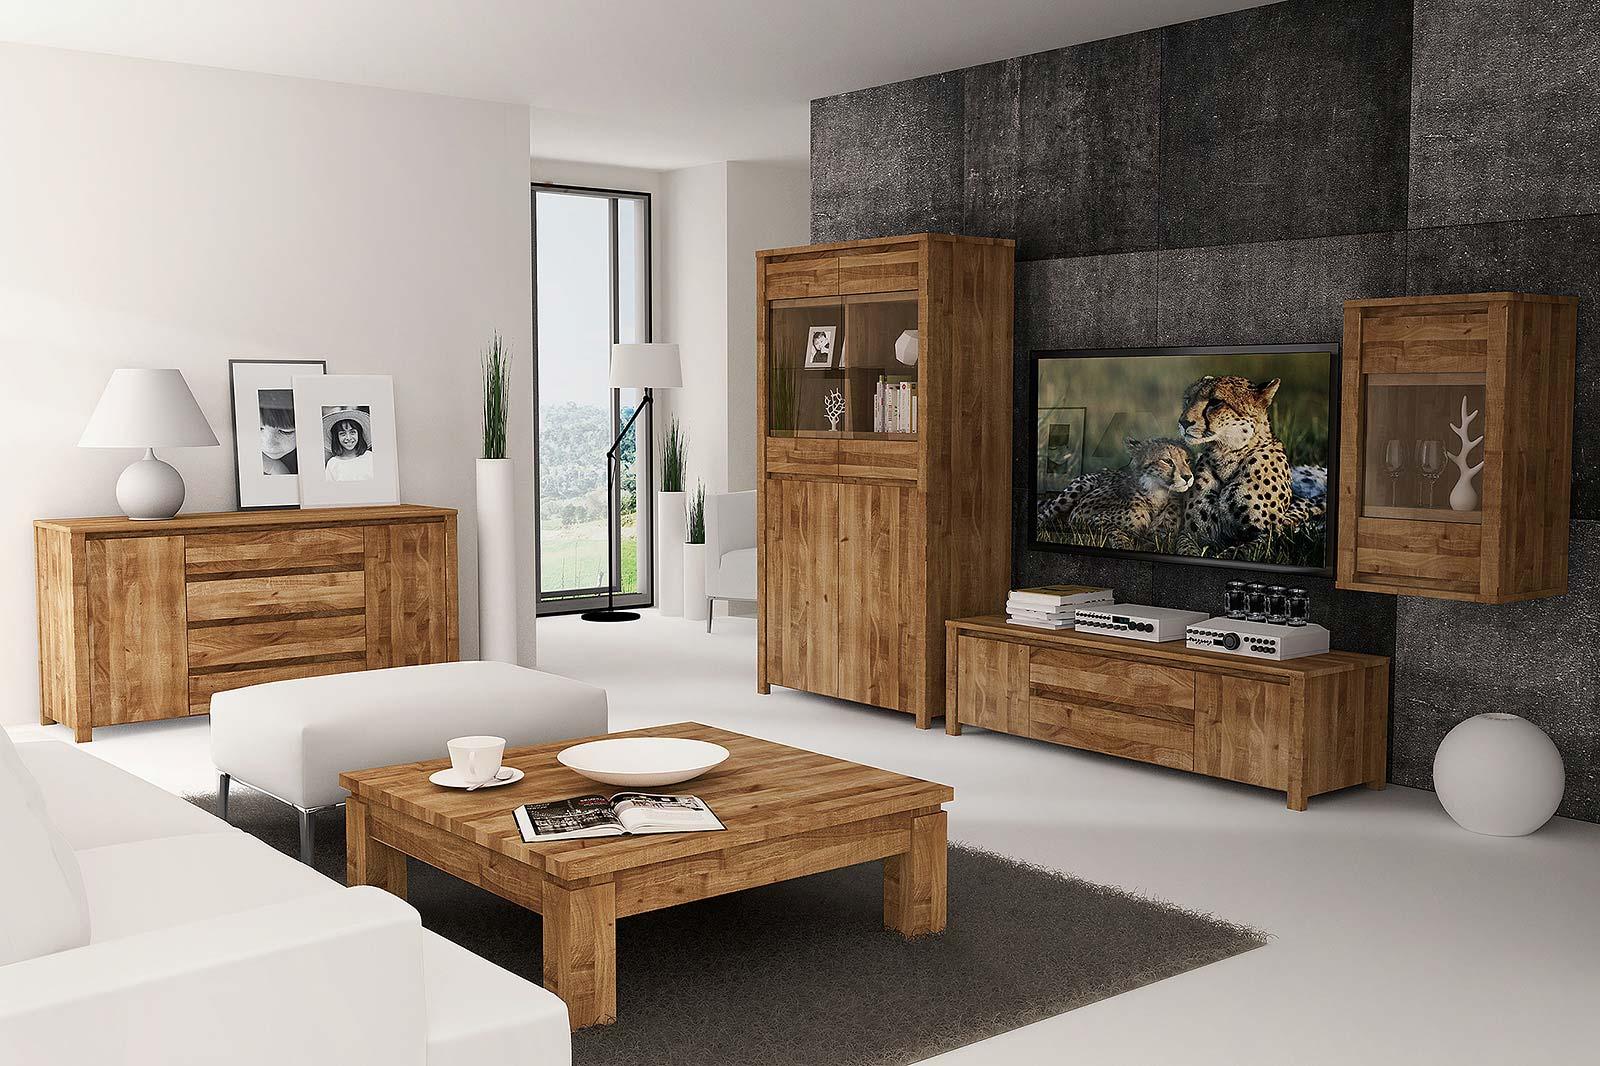 Salon lite drewno z kolekcji Vinci